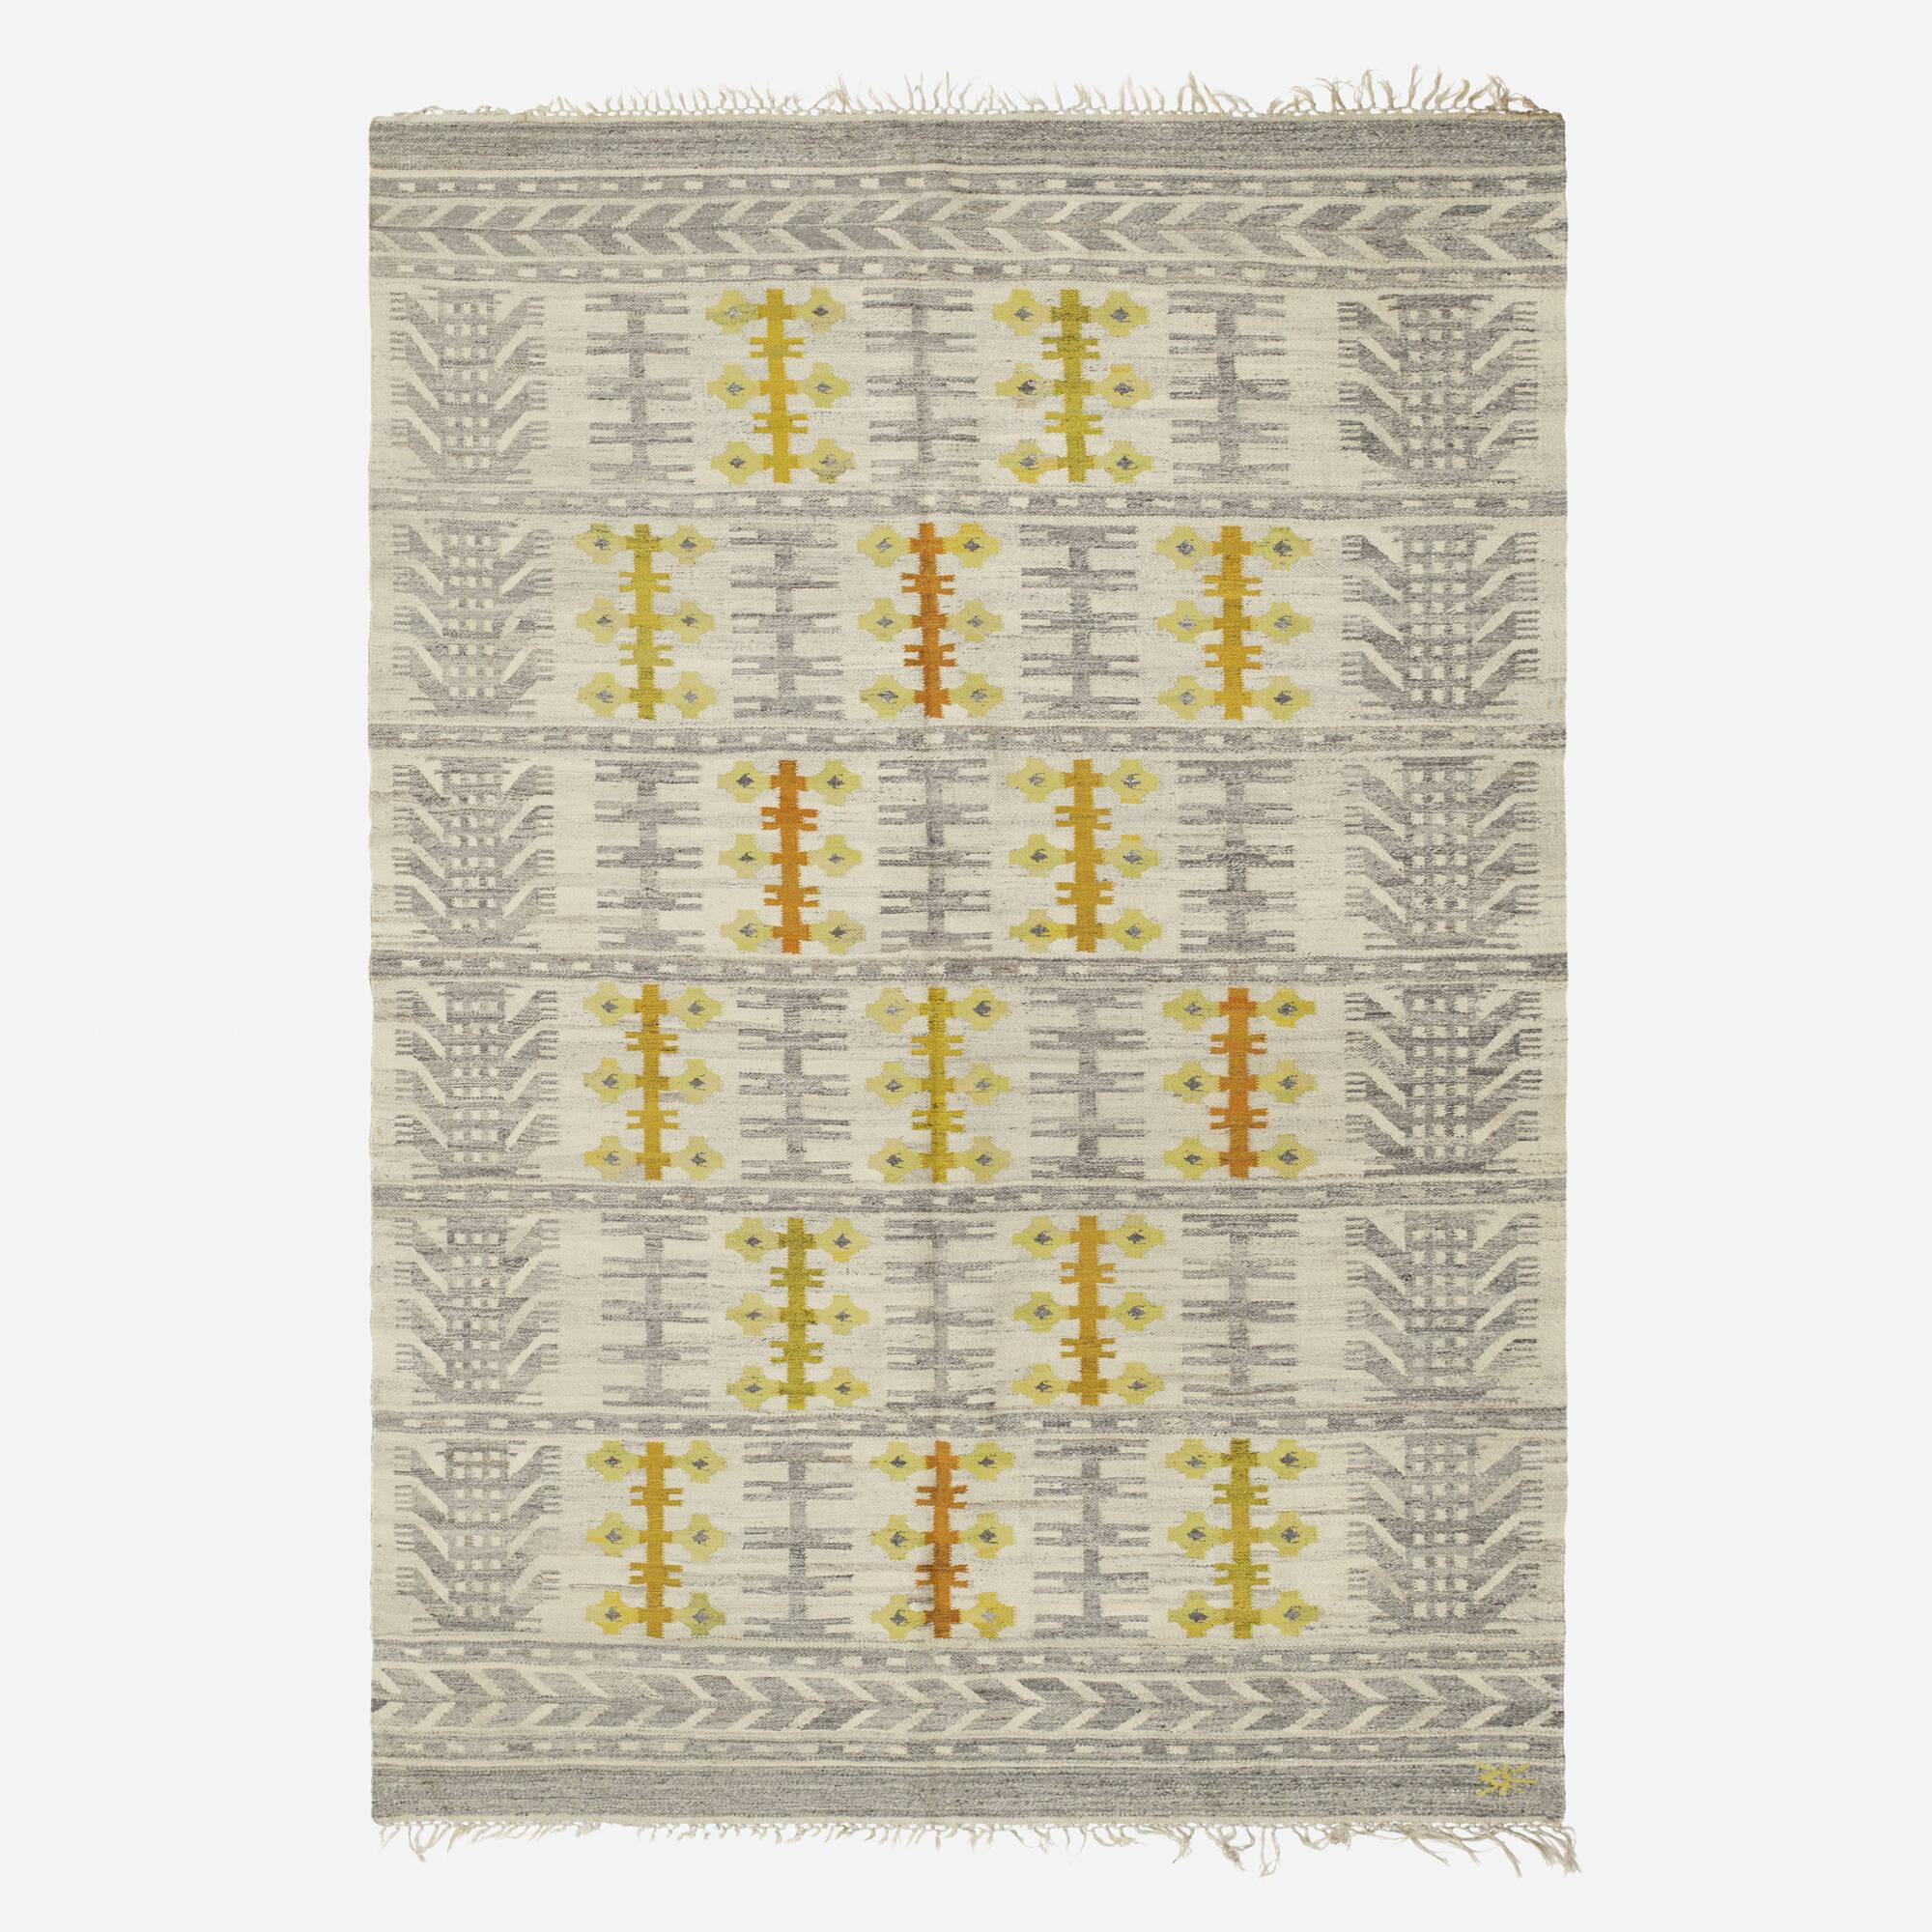 203: Swedish / flatweave carpet (1 of 2)